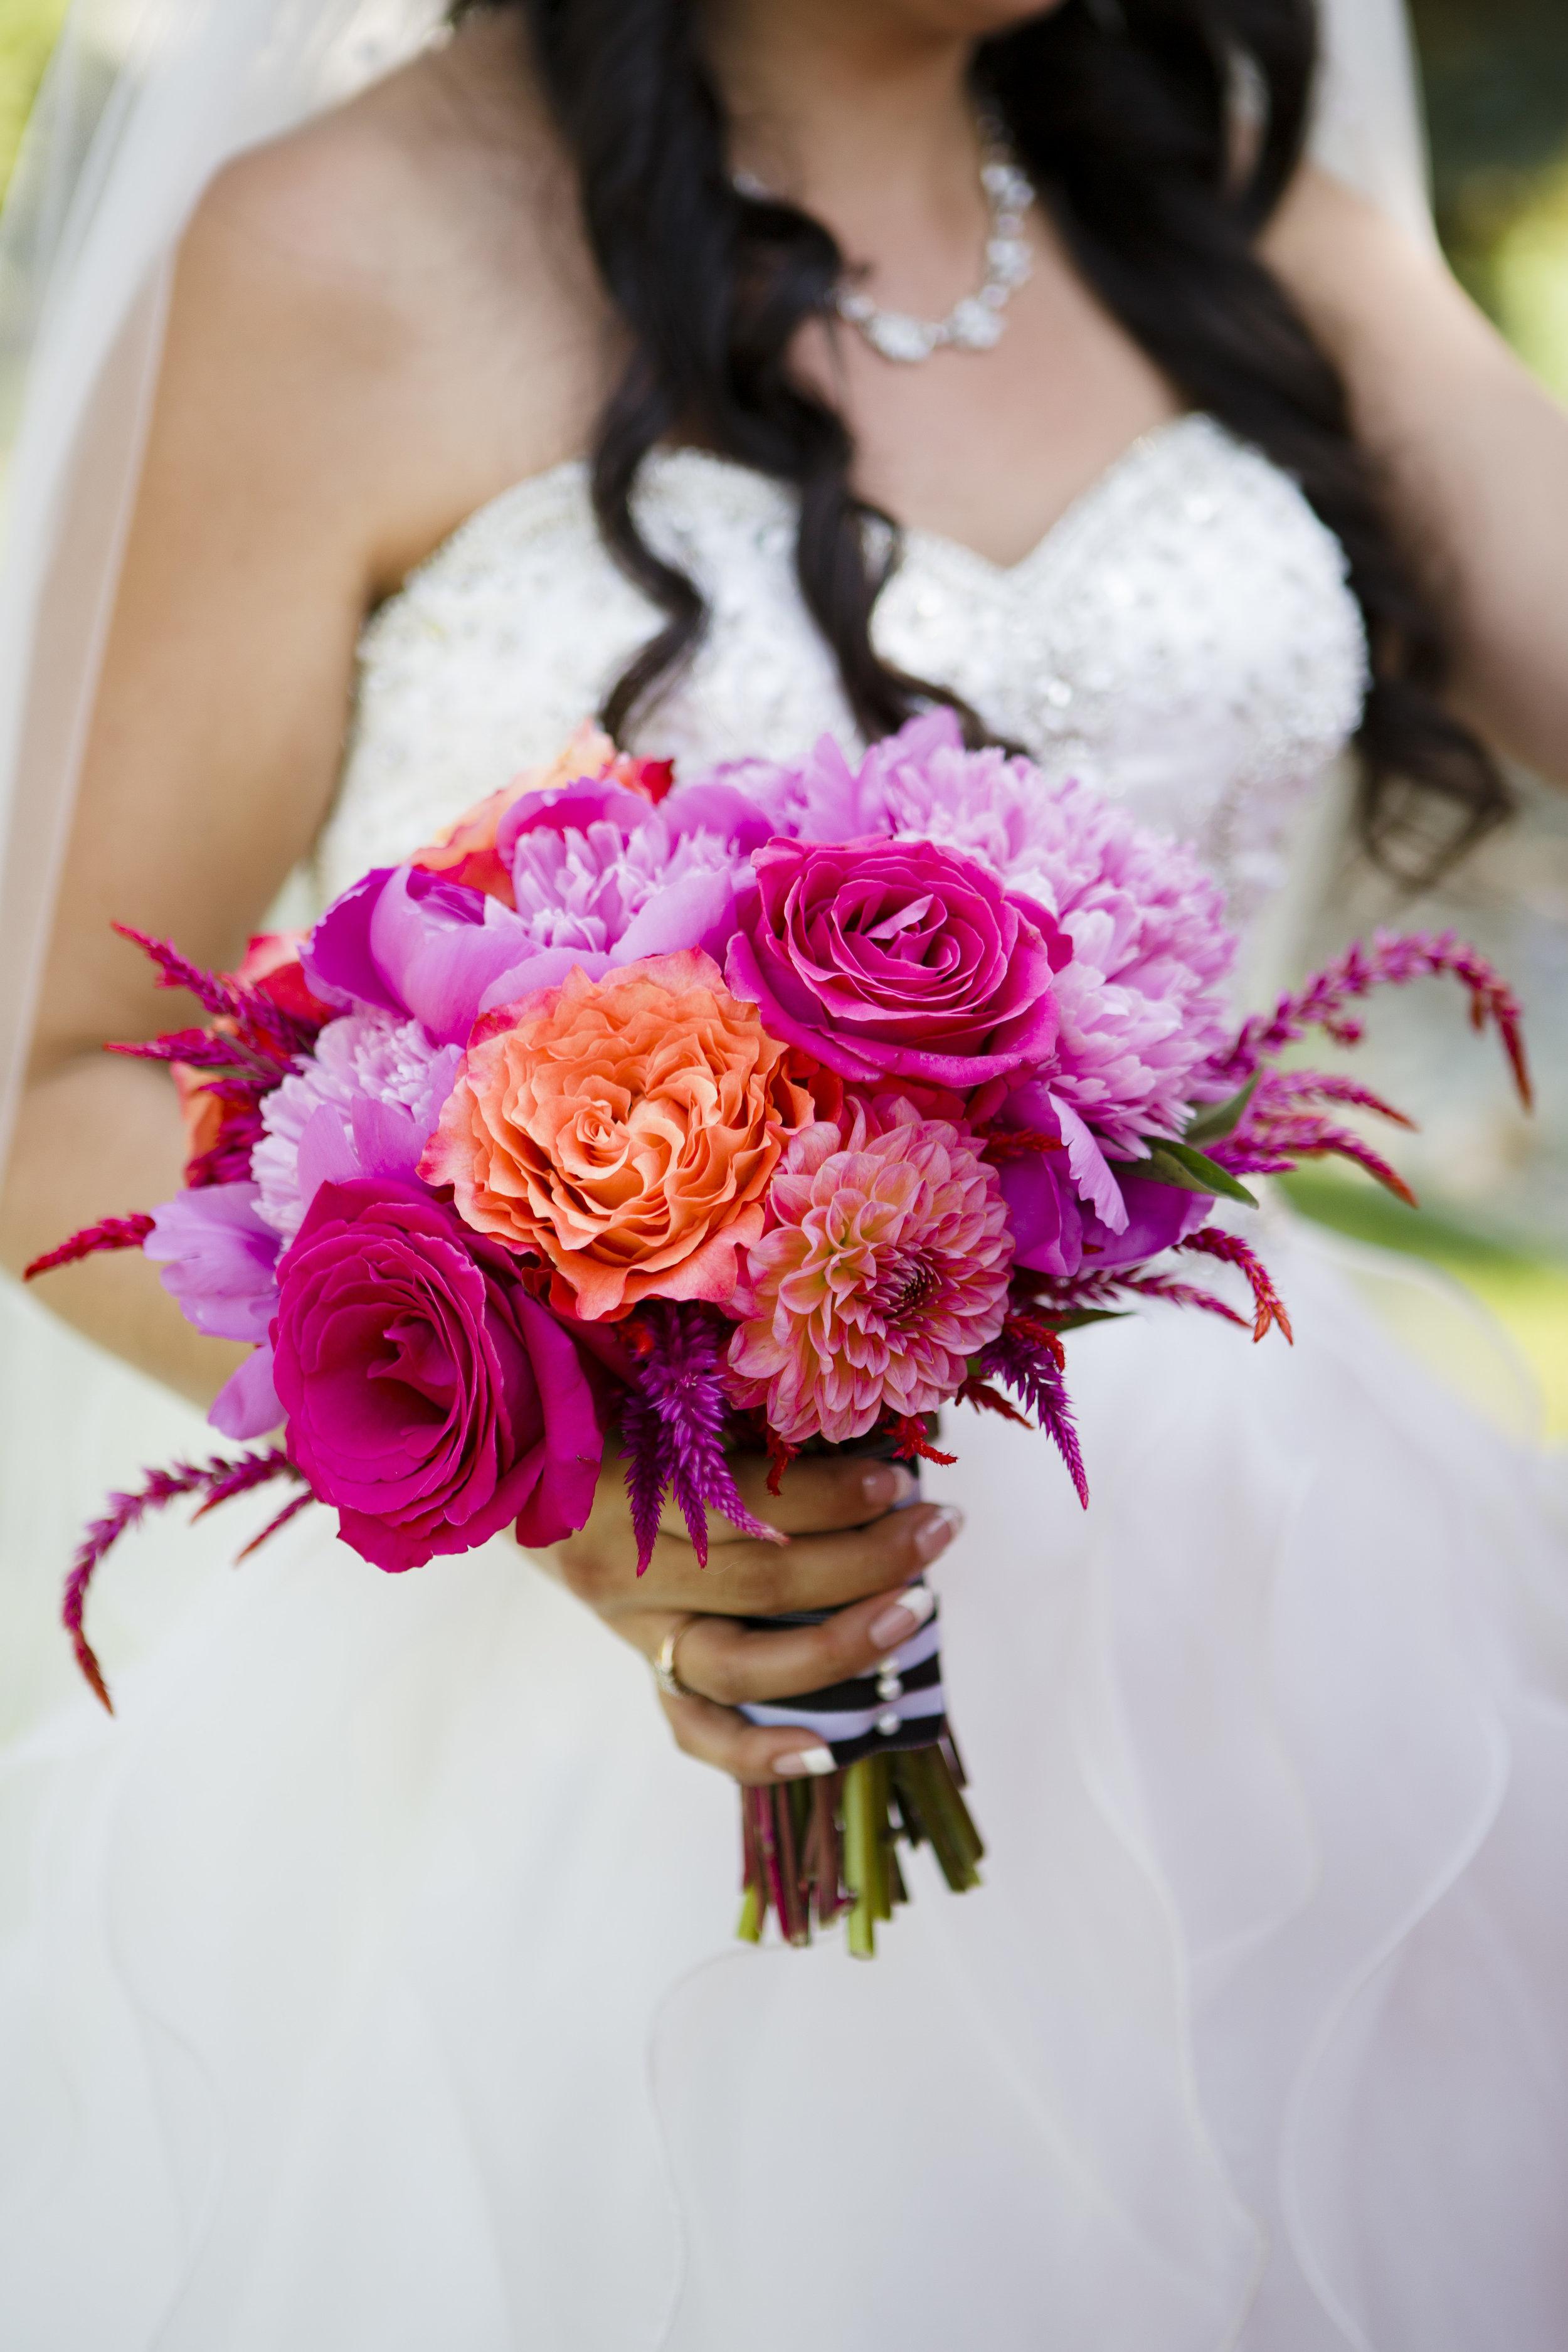 kristen-vance-2016-summer-loveland-colorado-wedding-1.jpg